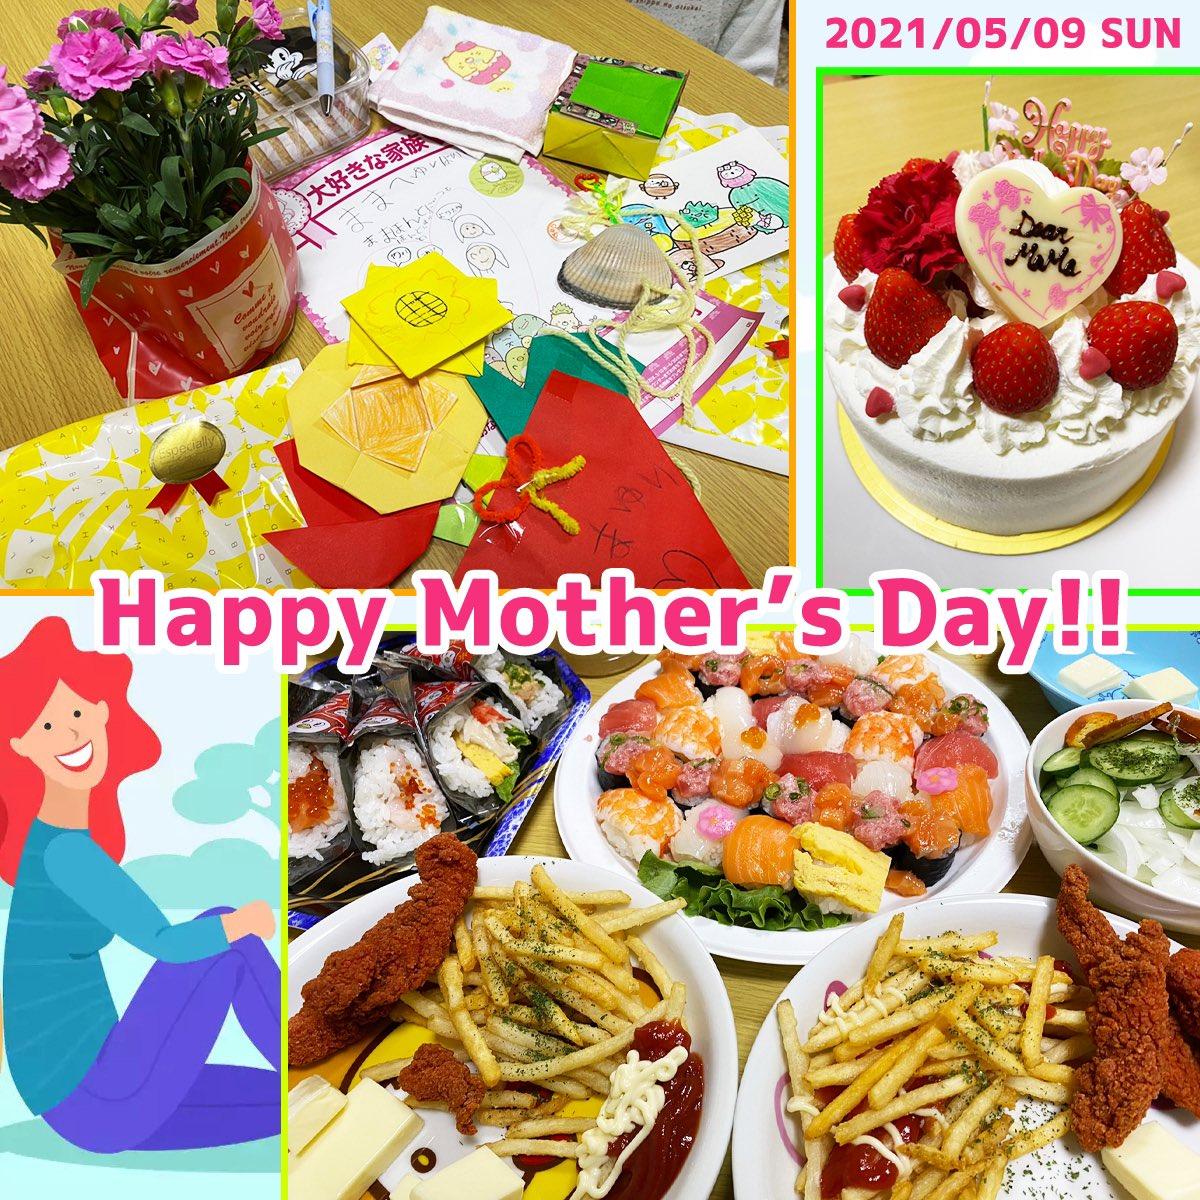 test ツイッターメディア - Happy Mother's Day❣️ https://t.co/DtafW0JoU2